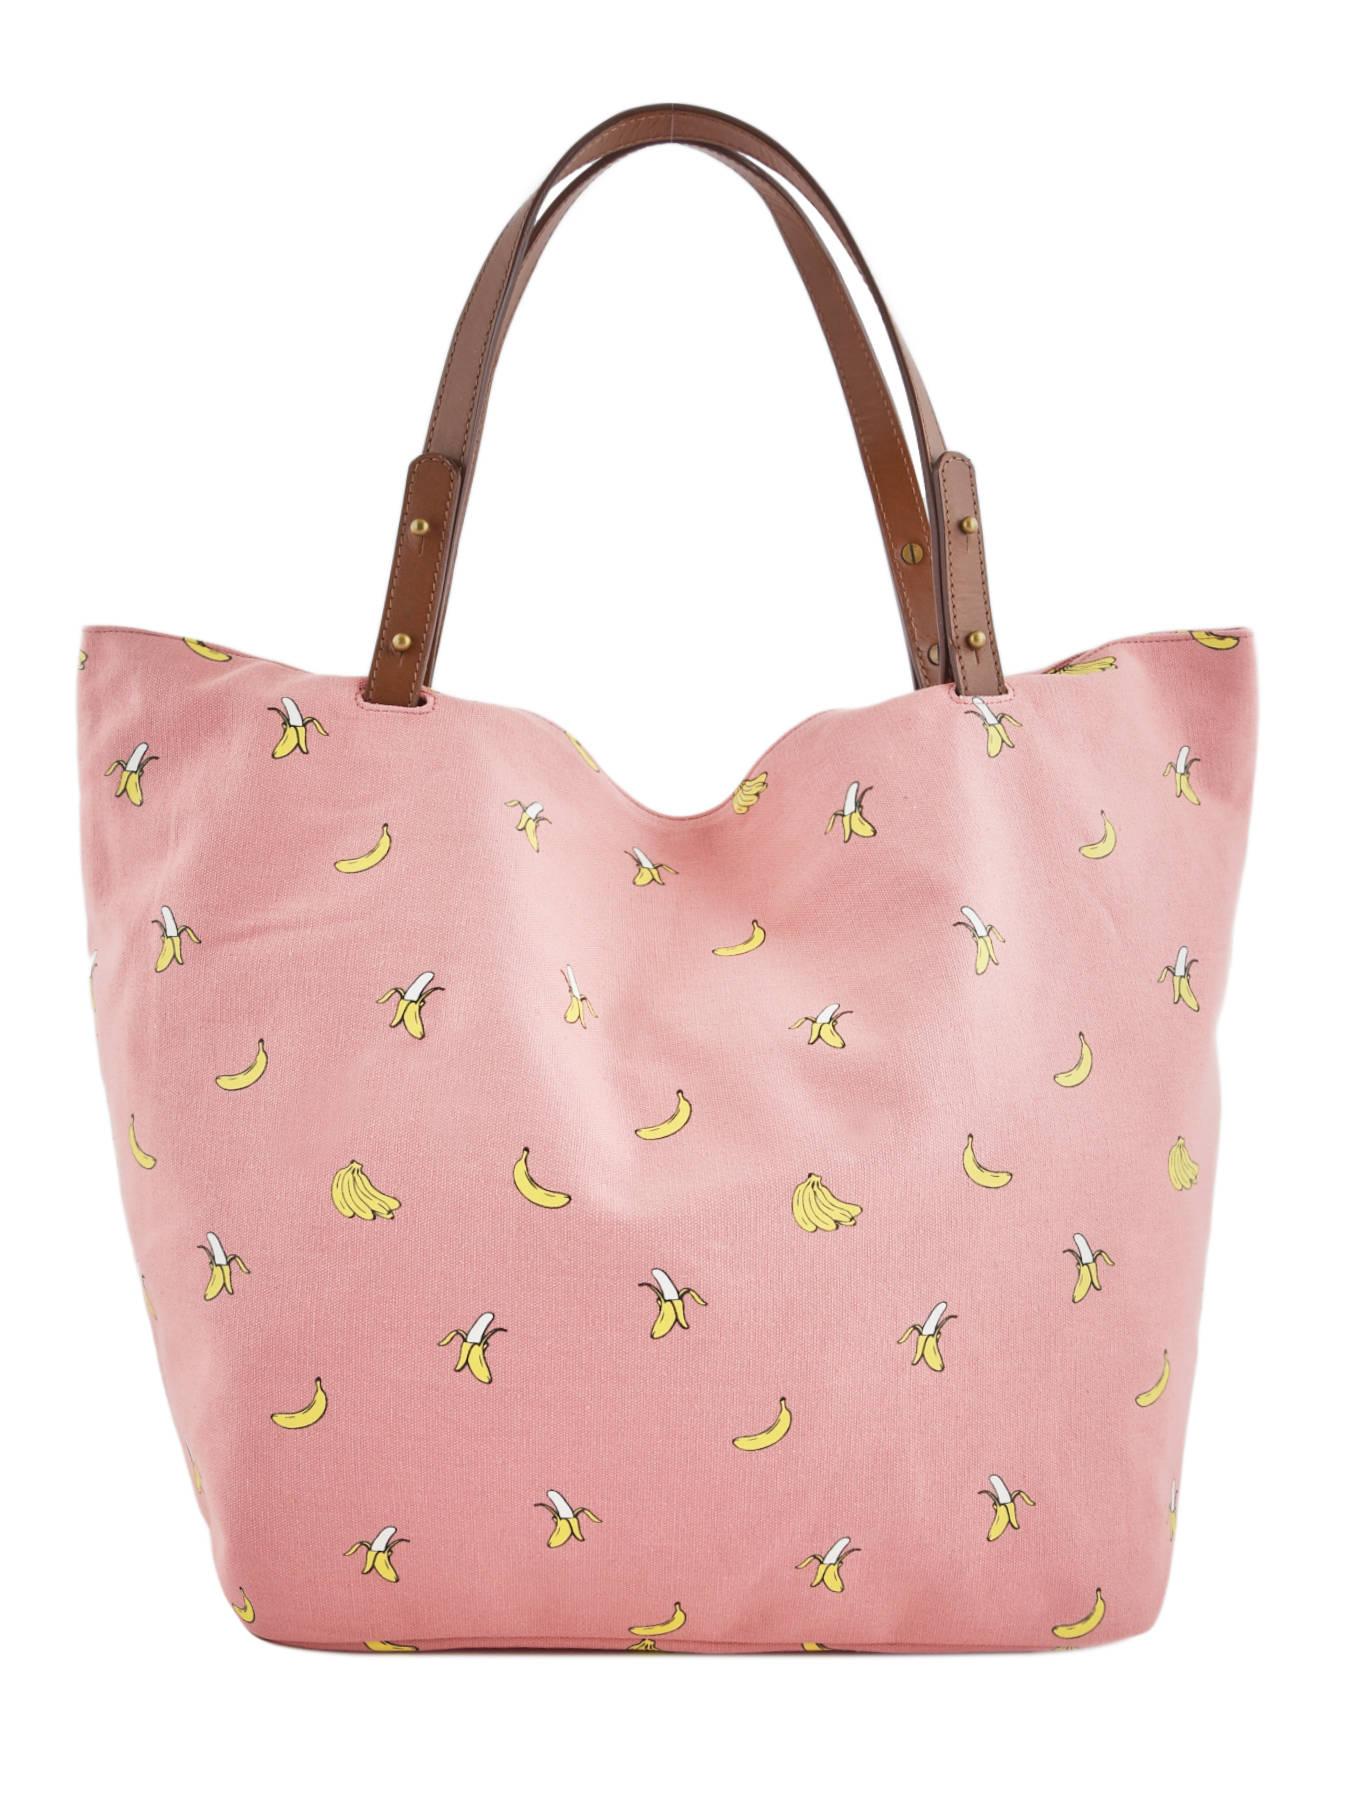 ebe526ebc1 Tas Petite Mendigote Clea bags Clea bags te koop aan de beste prijs